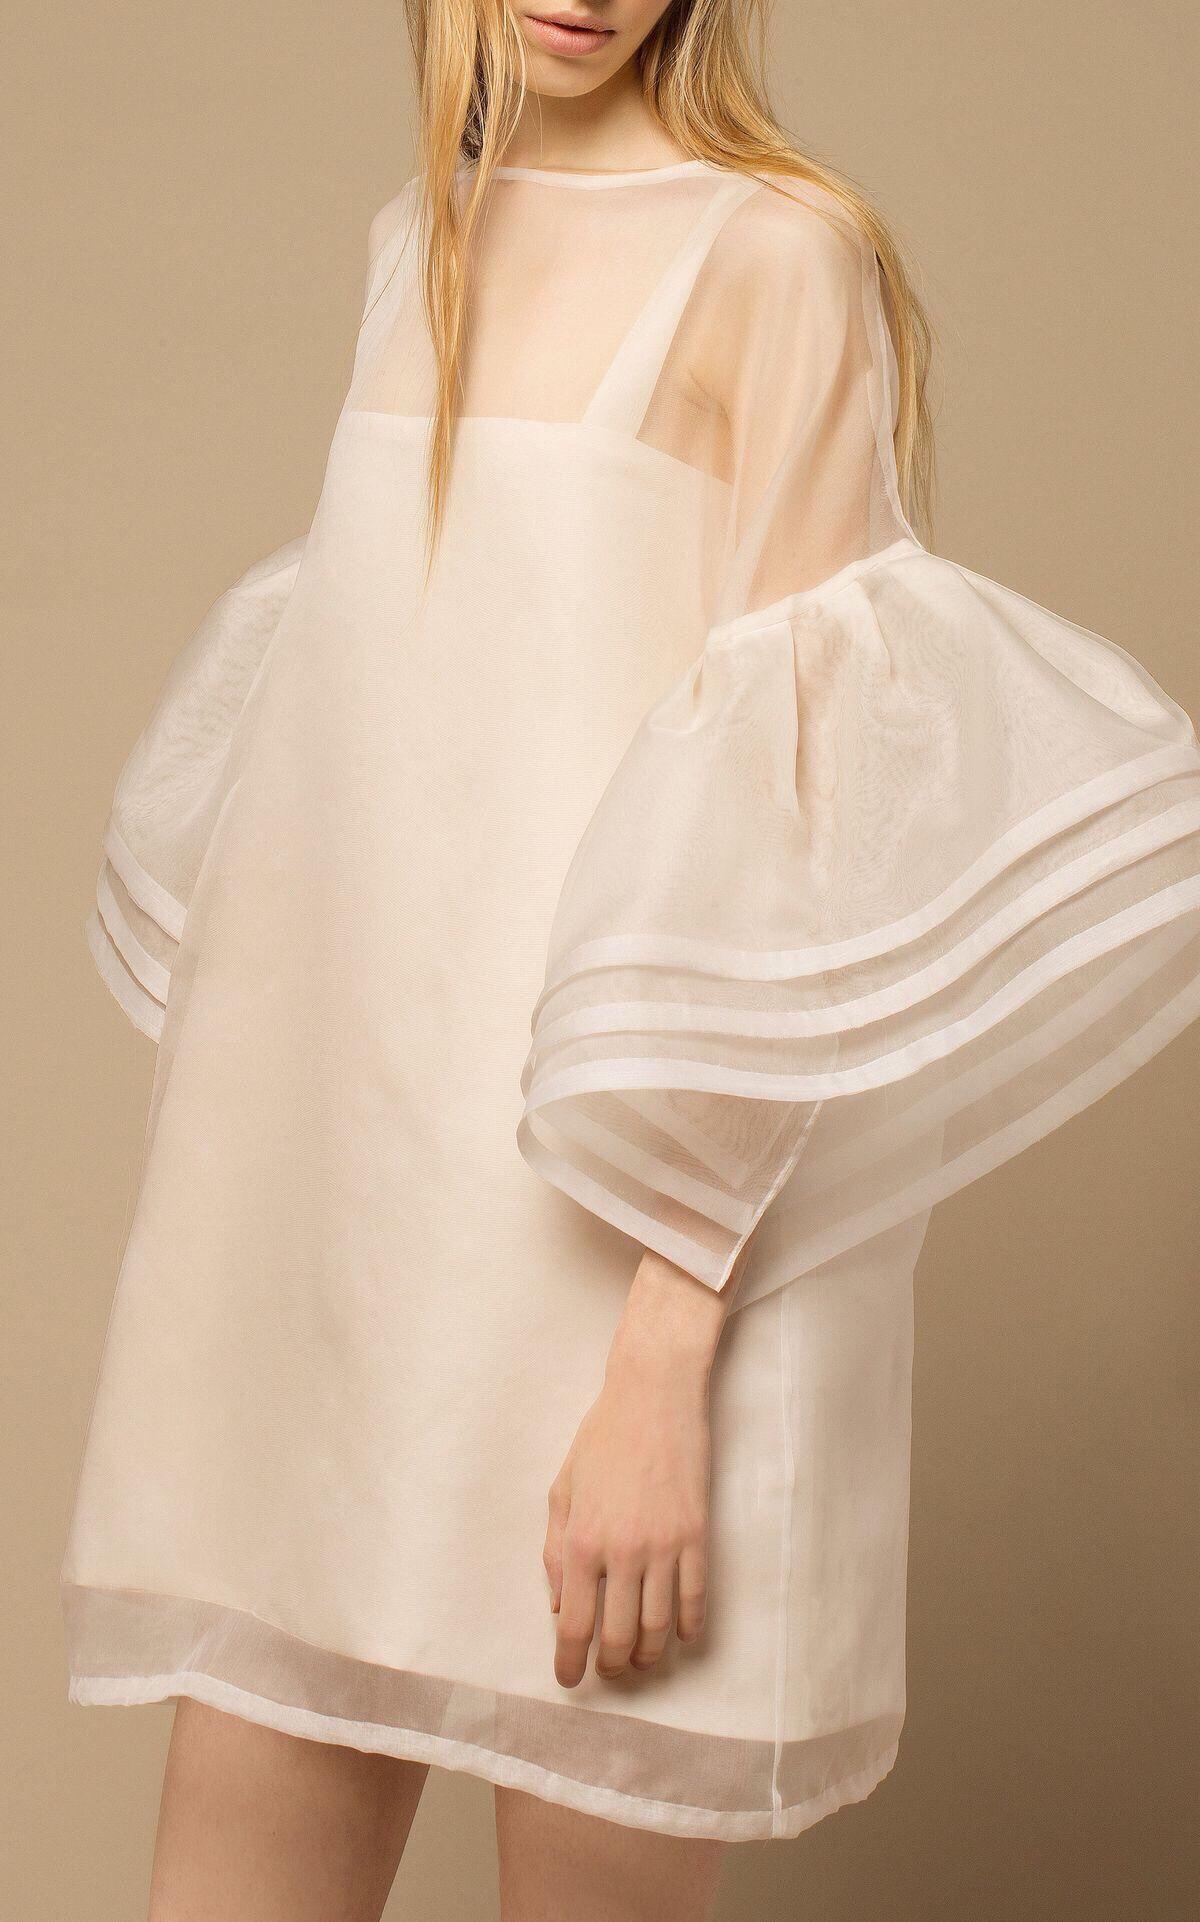 fded552ad1d2 ... πίνακα fashion style pattern του χρήστη Kathrin Jordan. Τάσεις Της  Μόδας